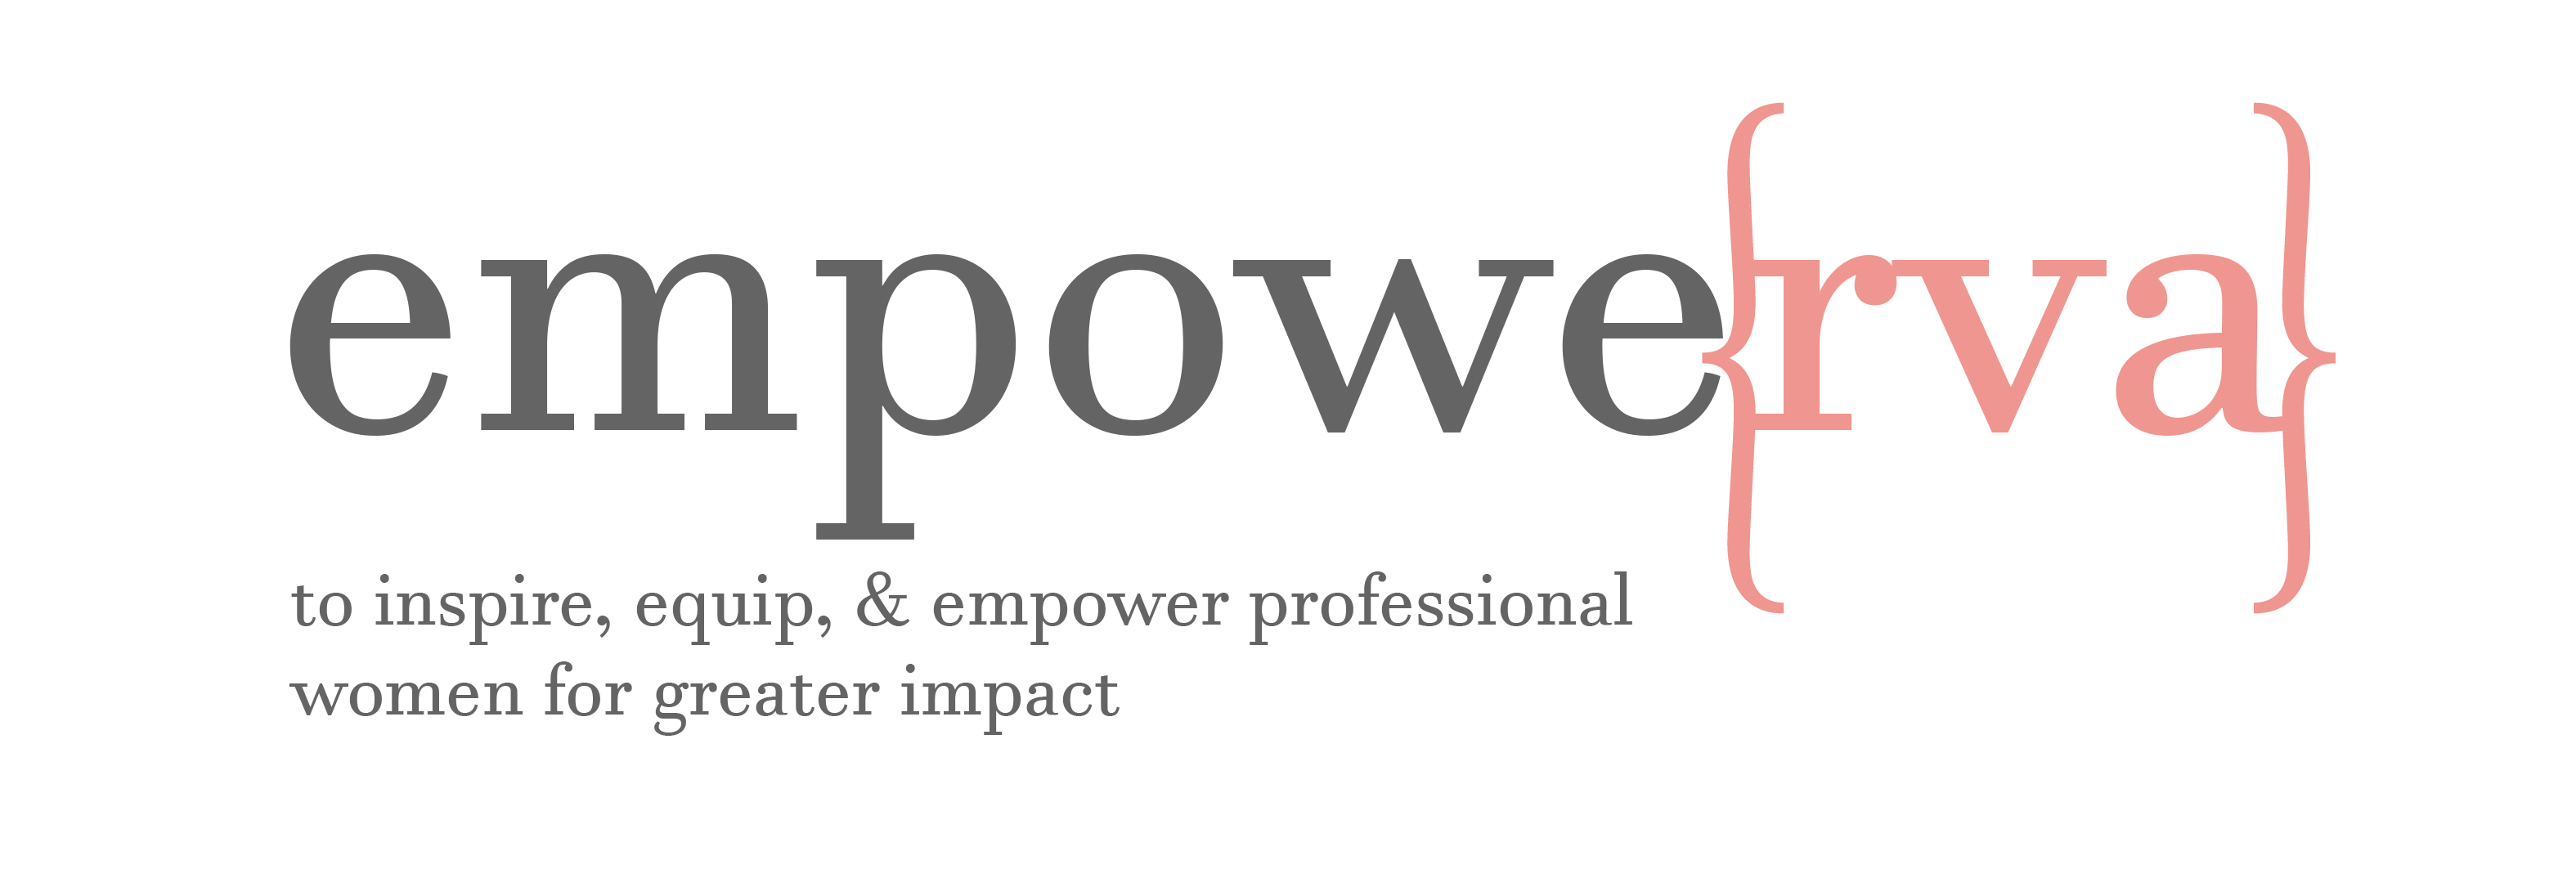 empower{rva}